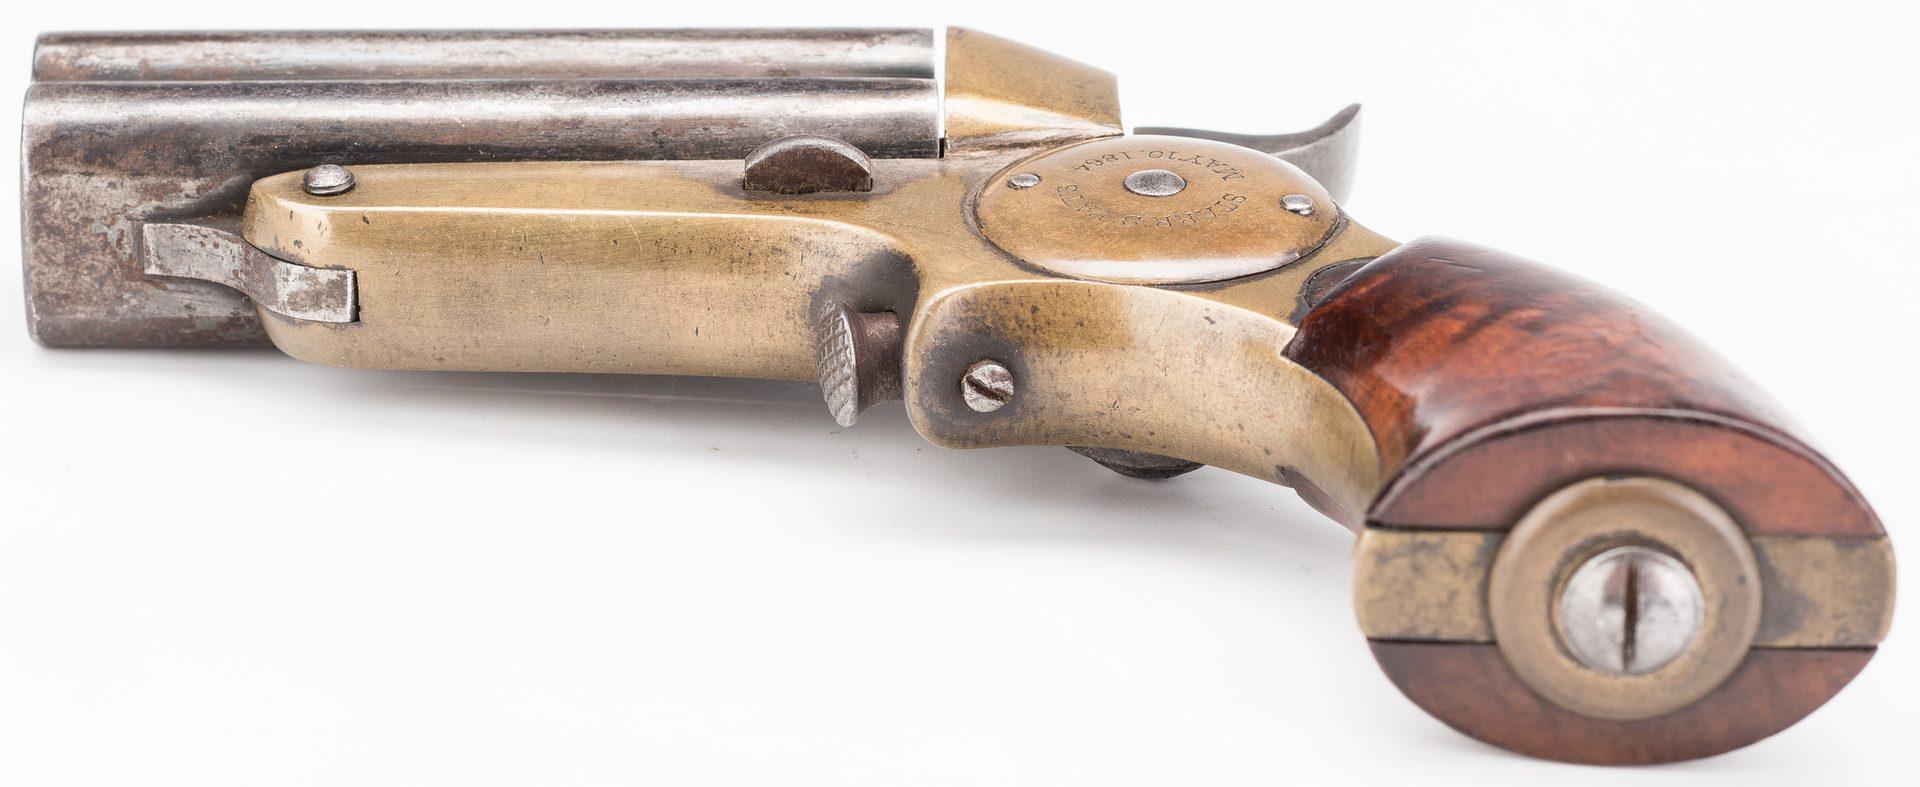 Lot 524: Starr Four Barrel Pepperbox Pistol, .32 Rimfire Cal.